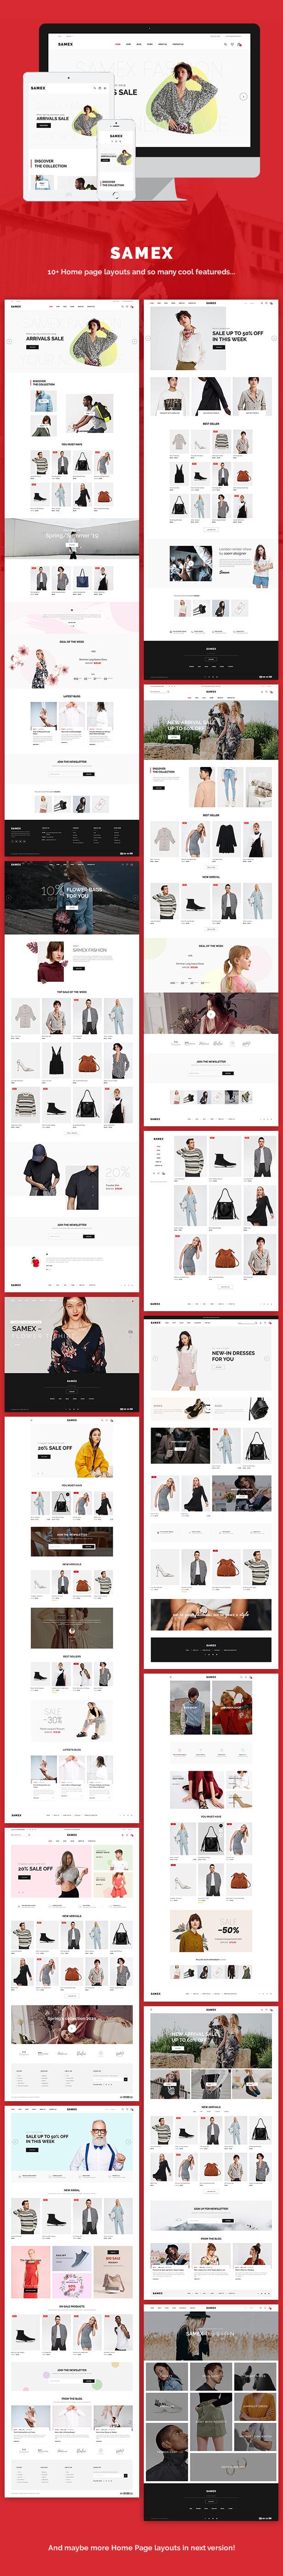 Samex - Clean, Minimal Shop WooCommerce WordPress Theme - 1